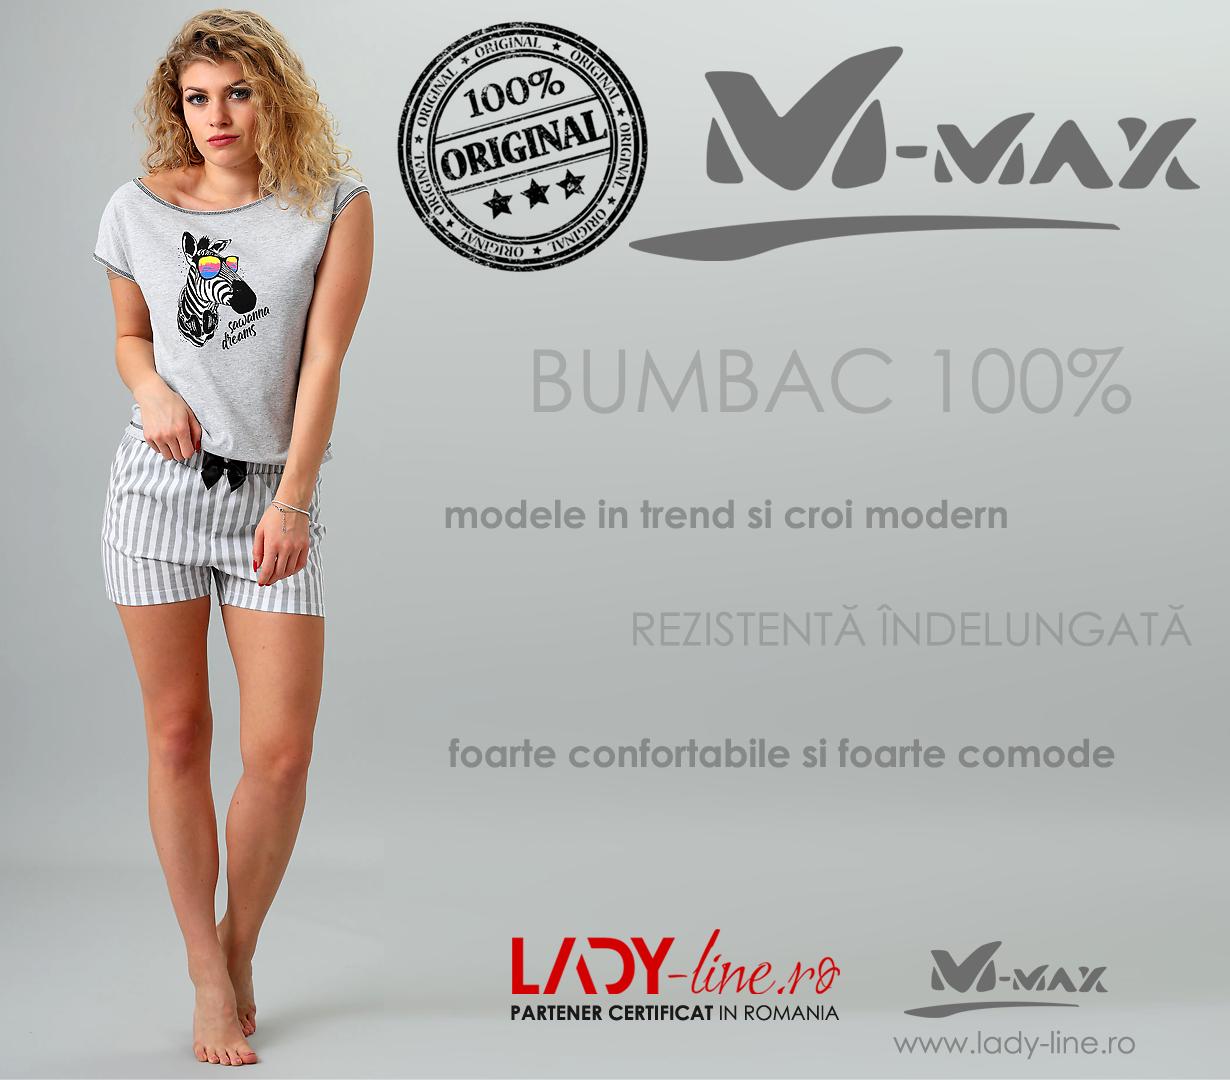 Pijamale Dama M-Max, Bumbac 100%, 'Sawanna Dreams' Gray